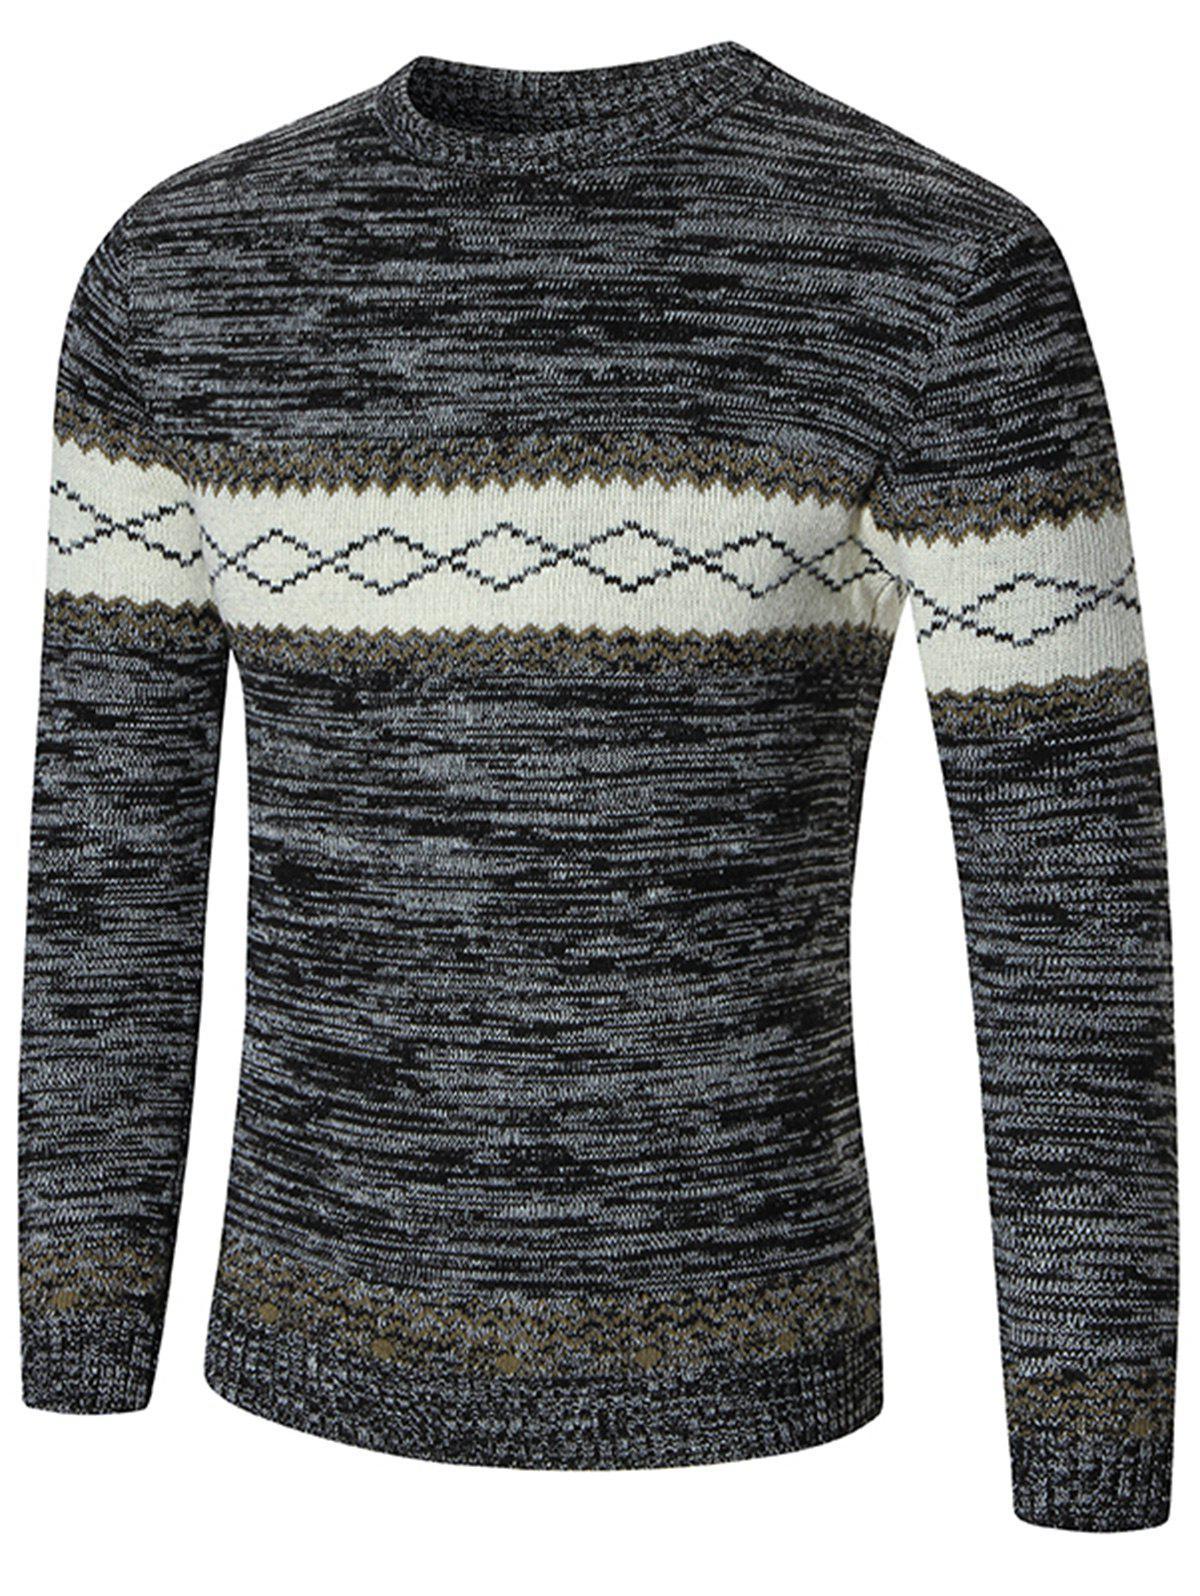 Crew Neck Space Dye Rhombus Pattern Sweater 218935403